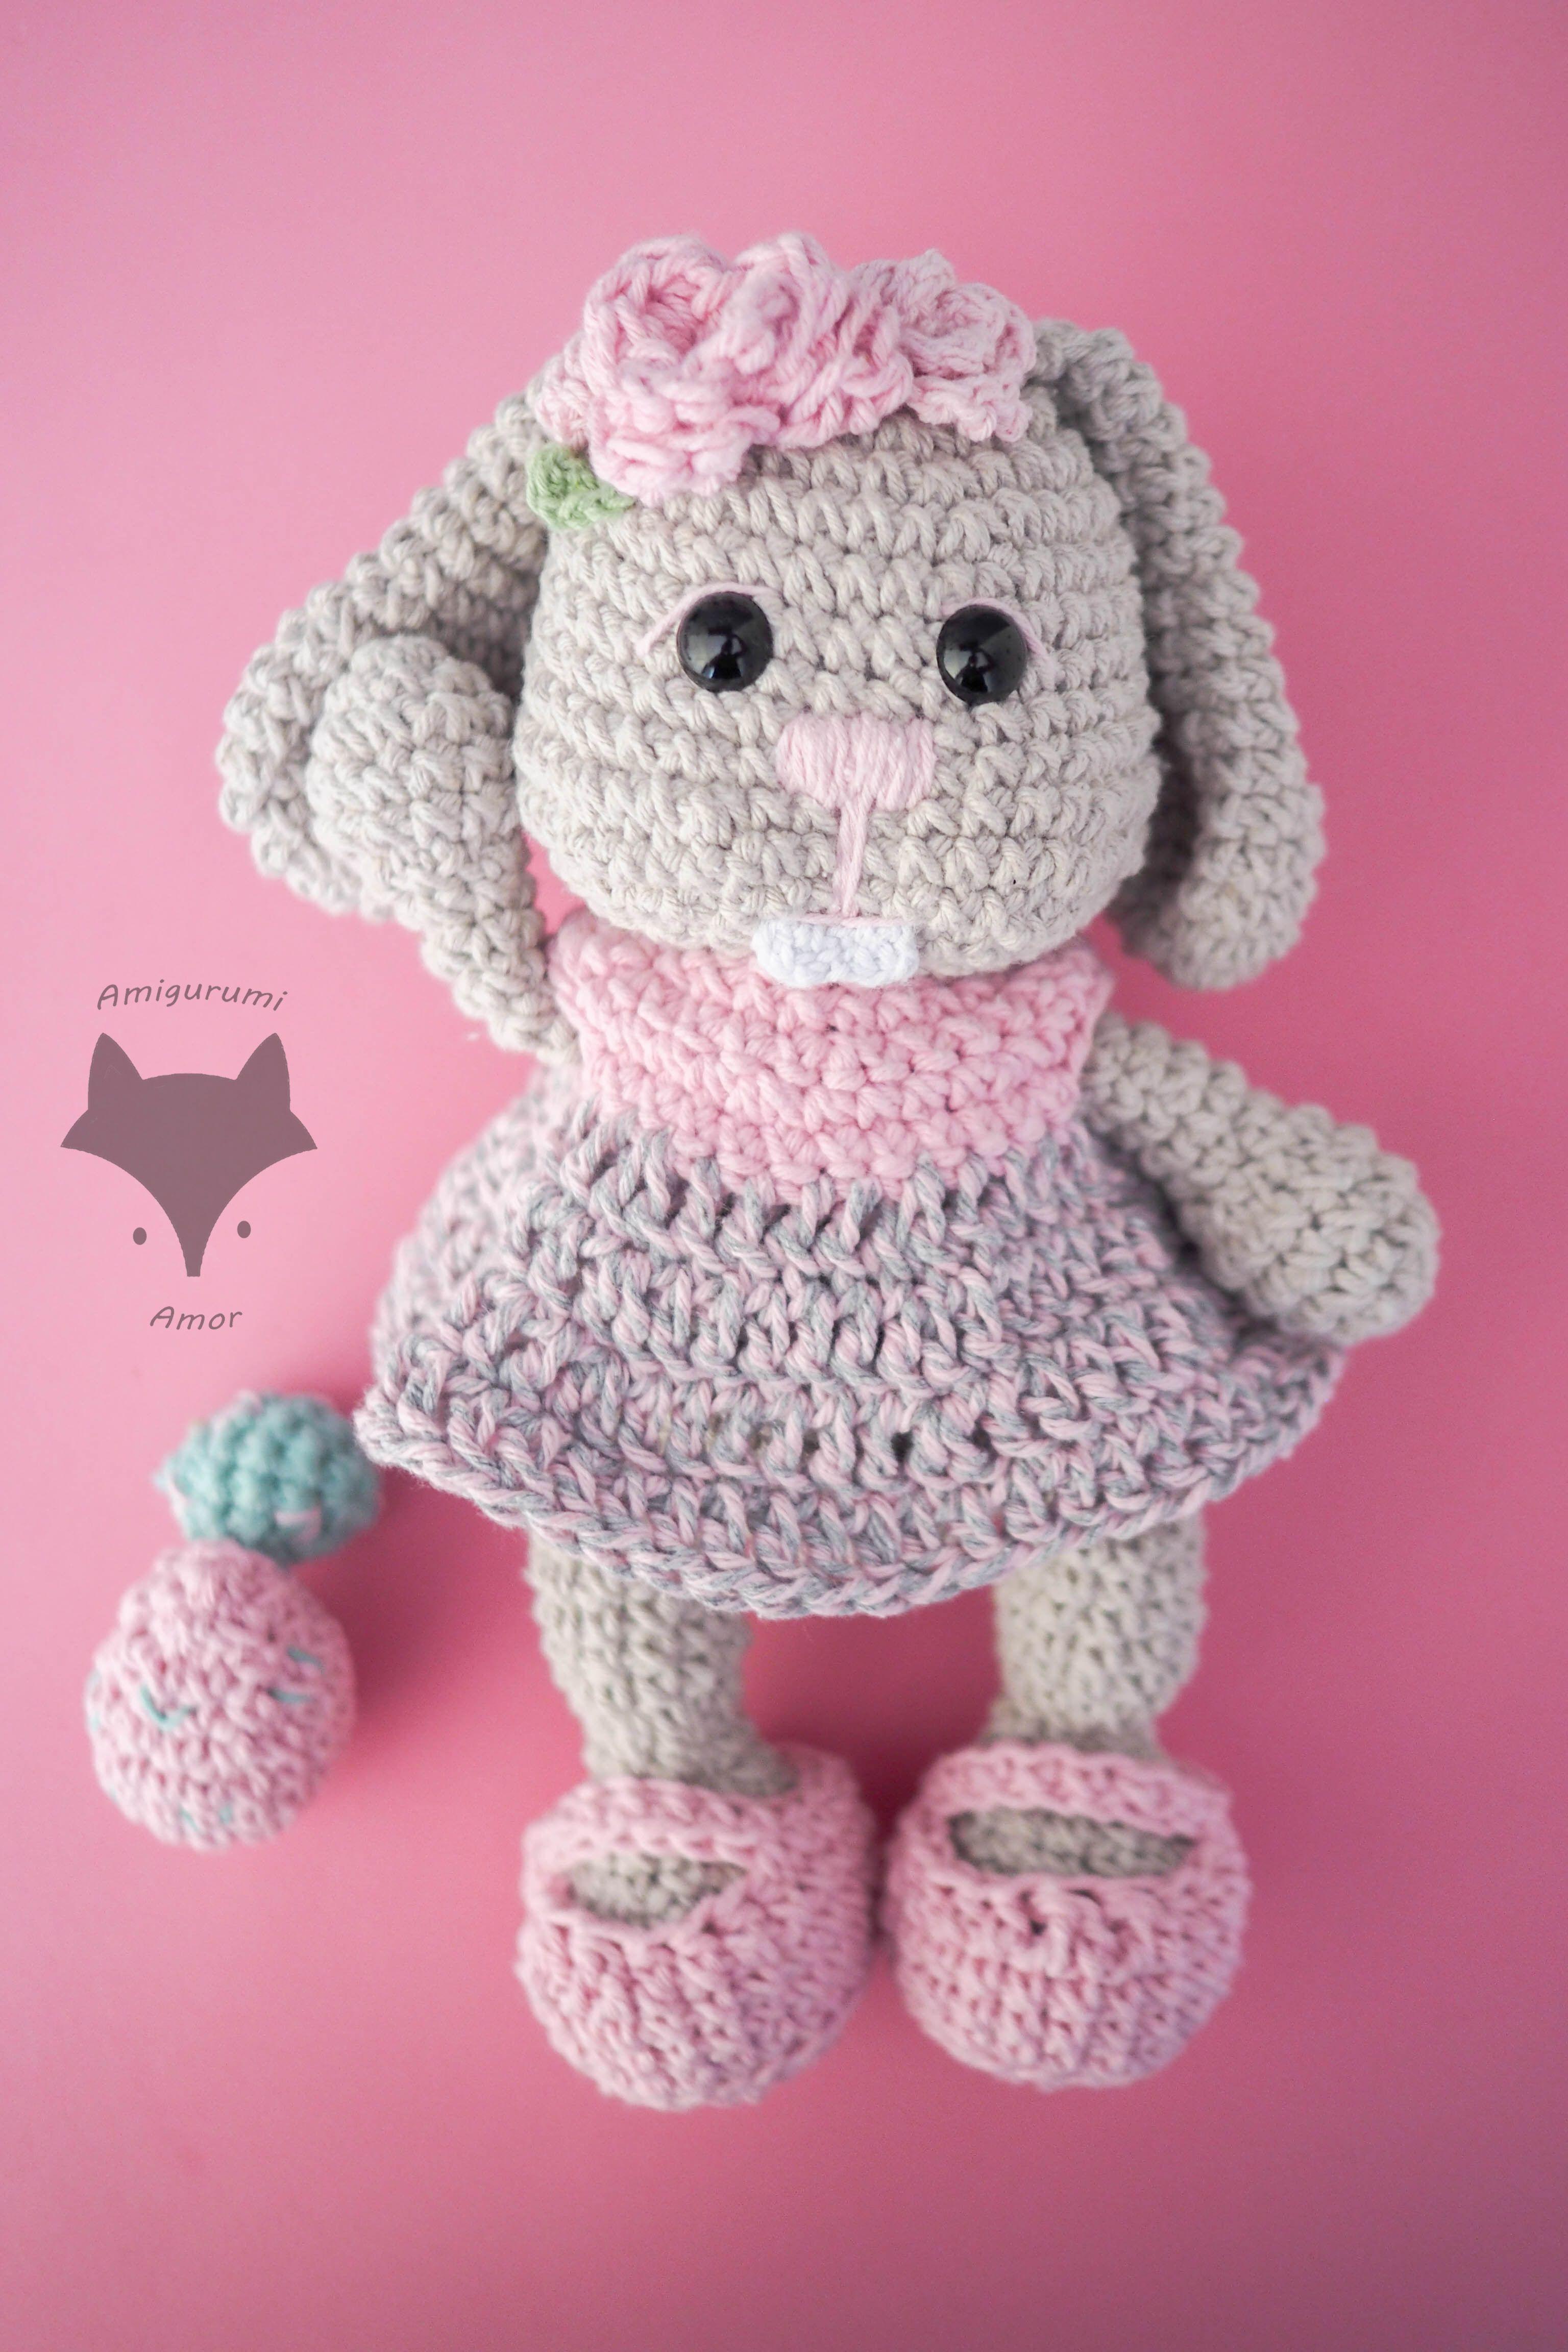 Big Hello Kitty Amigurumi Free Pattern | Padrão de boneca de ... | 4608x3072